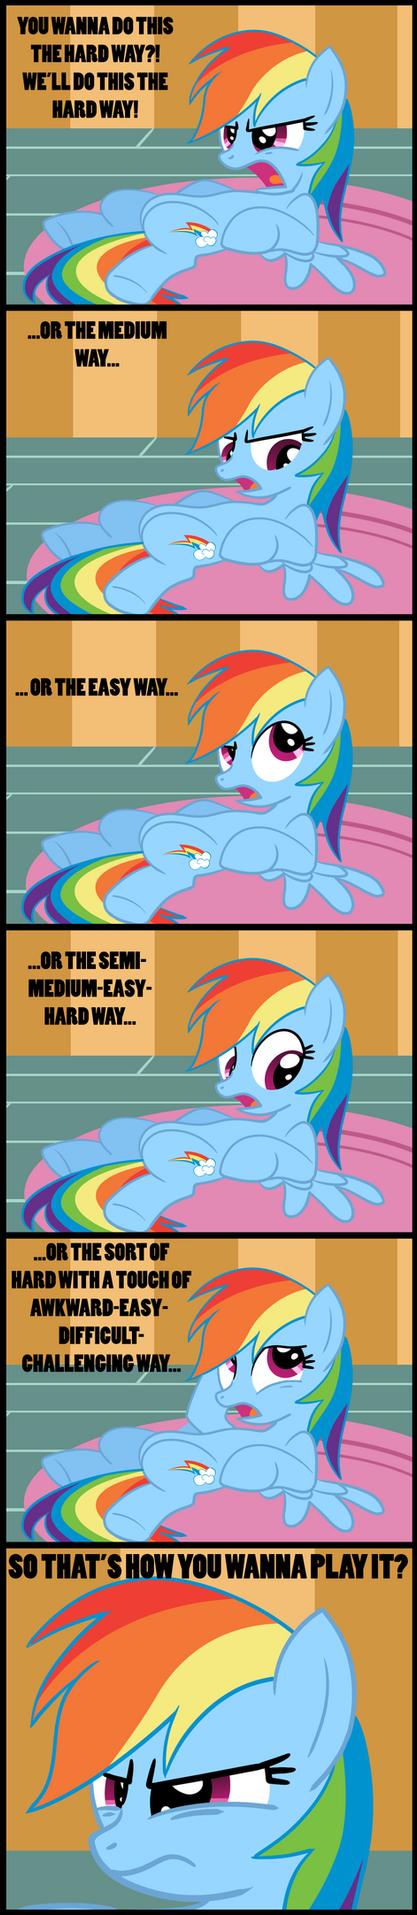 Rainbow Dash: You Wanna Do This the HARD Way? by JackiePhantom13